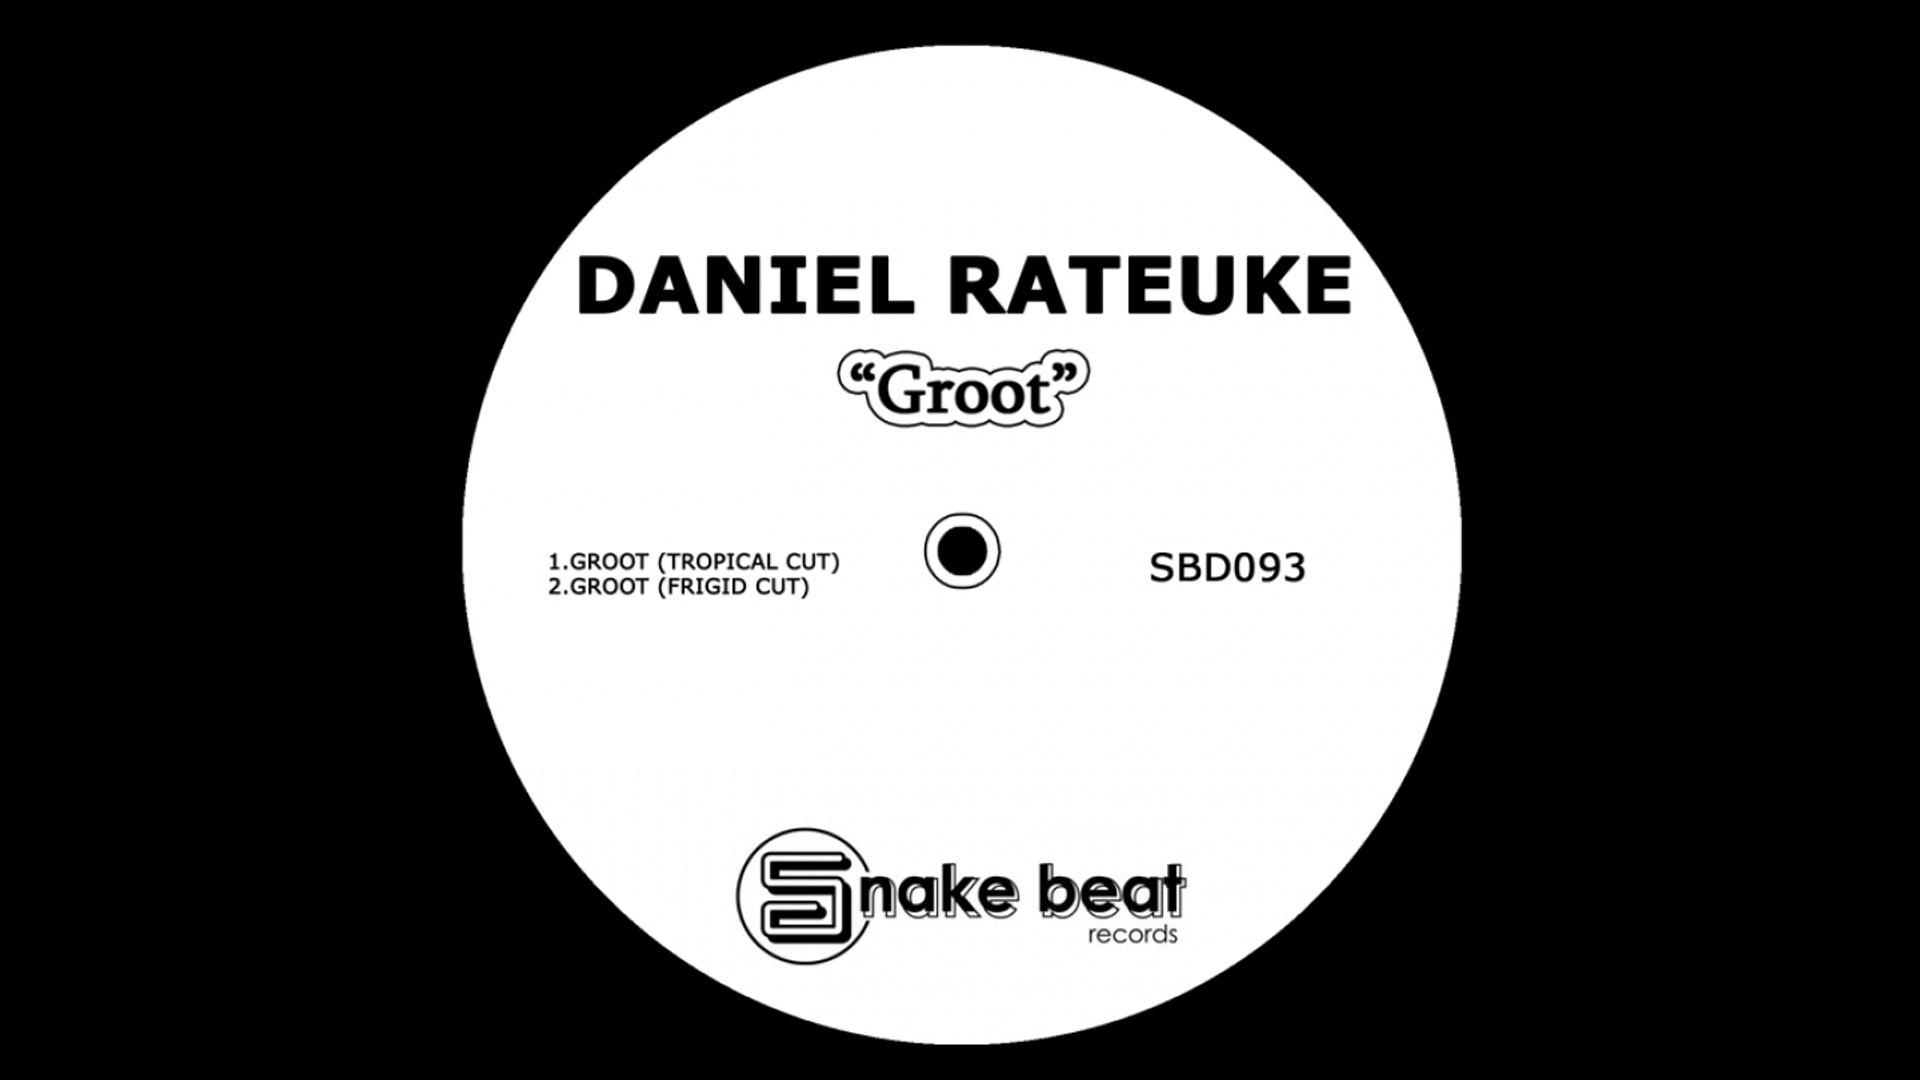 Daniel Rateuke - Groot - (Frigid Cut)